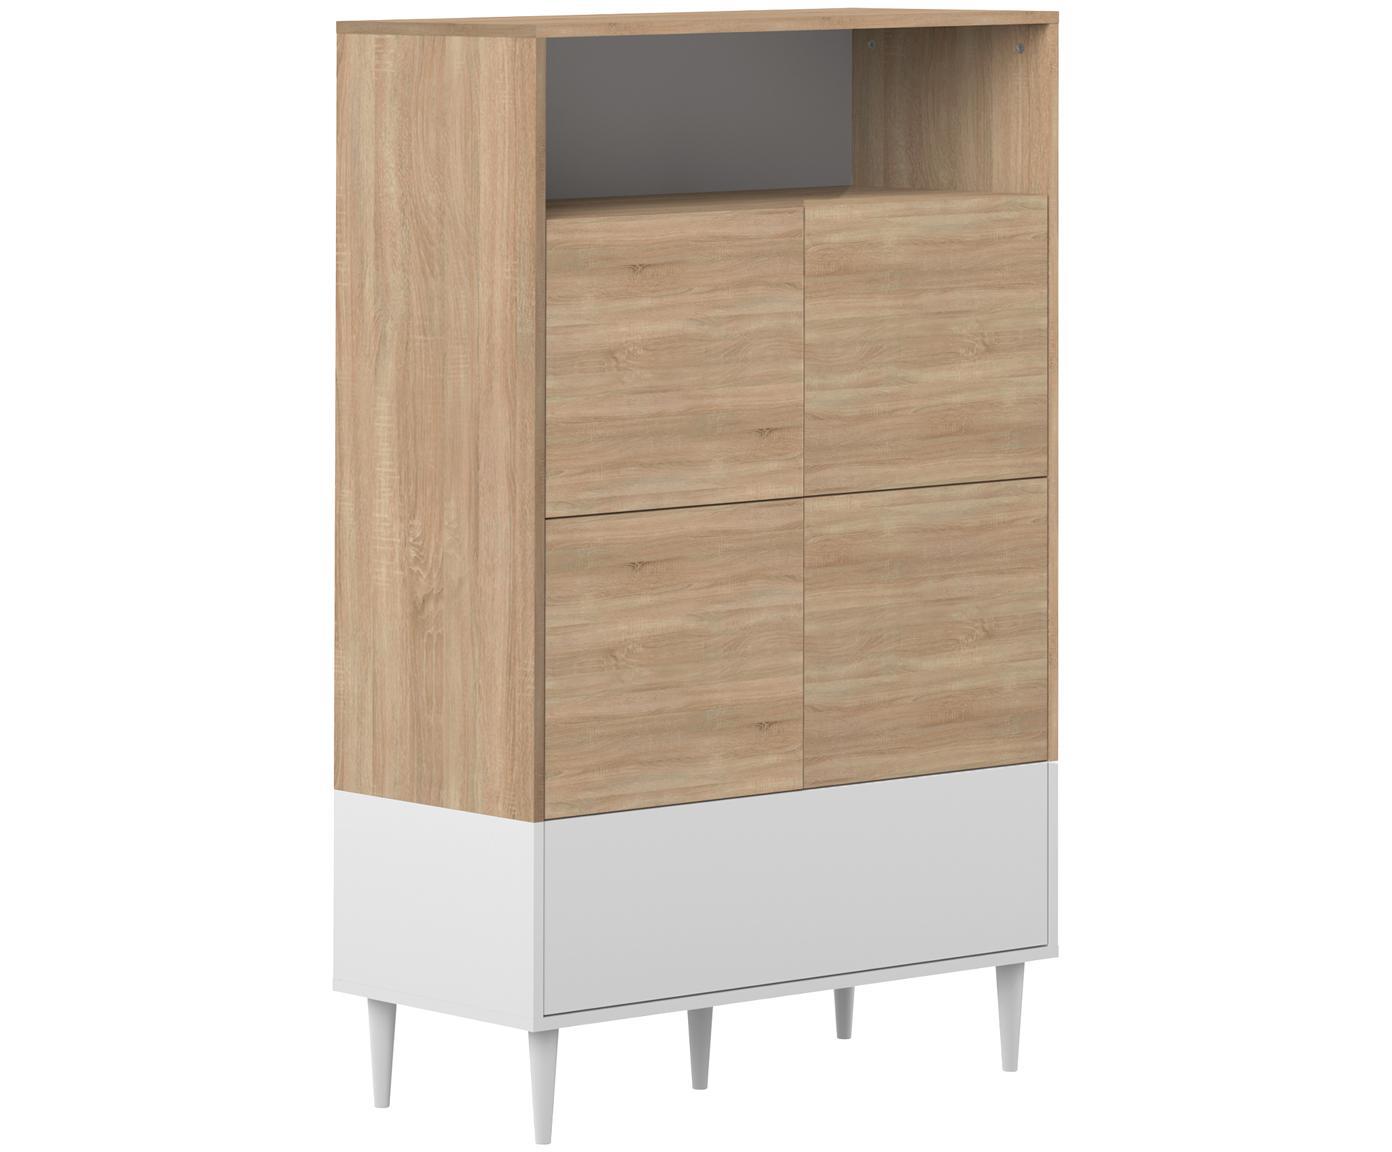 Hohes Highboard Horizon im Skandi Design, Korpus: Spanplatte, melaminbeschi, Eichenholz, Weiss, 90 x 141 cm